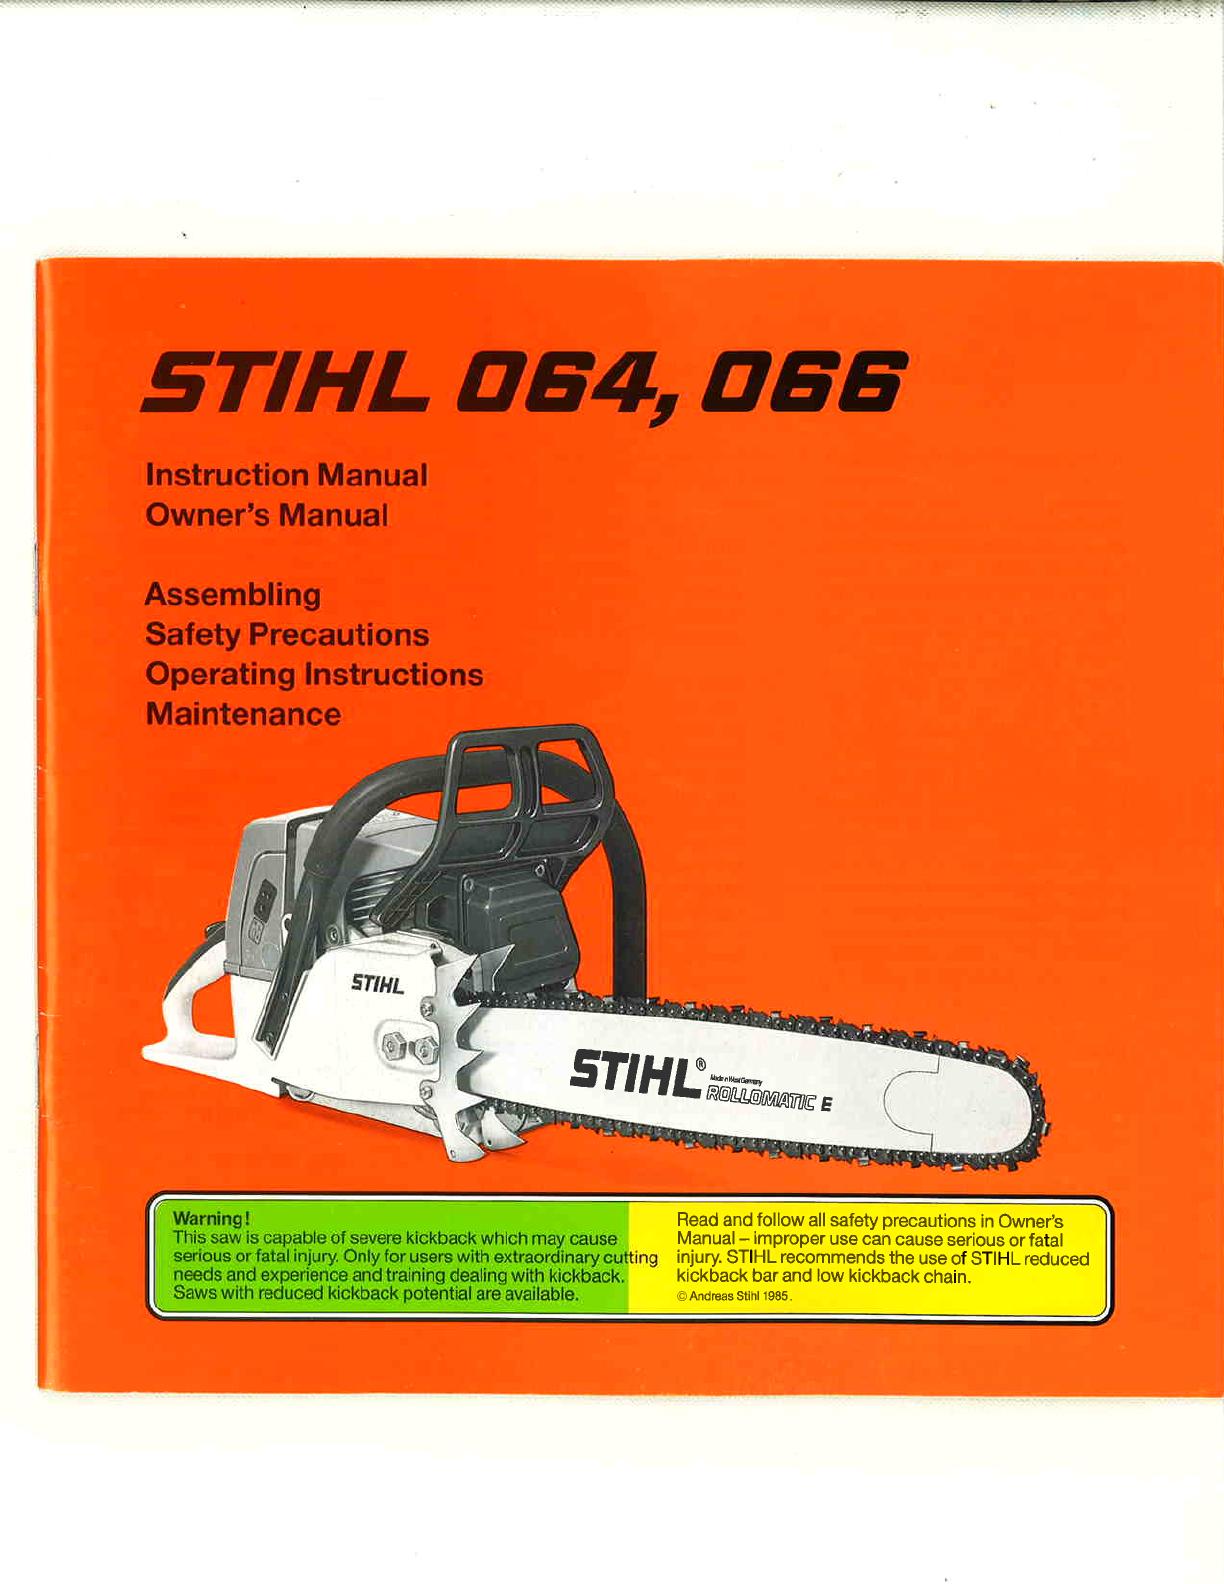 Stihl 064 066 chain saw service repair workshop manual download.